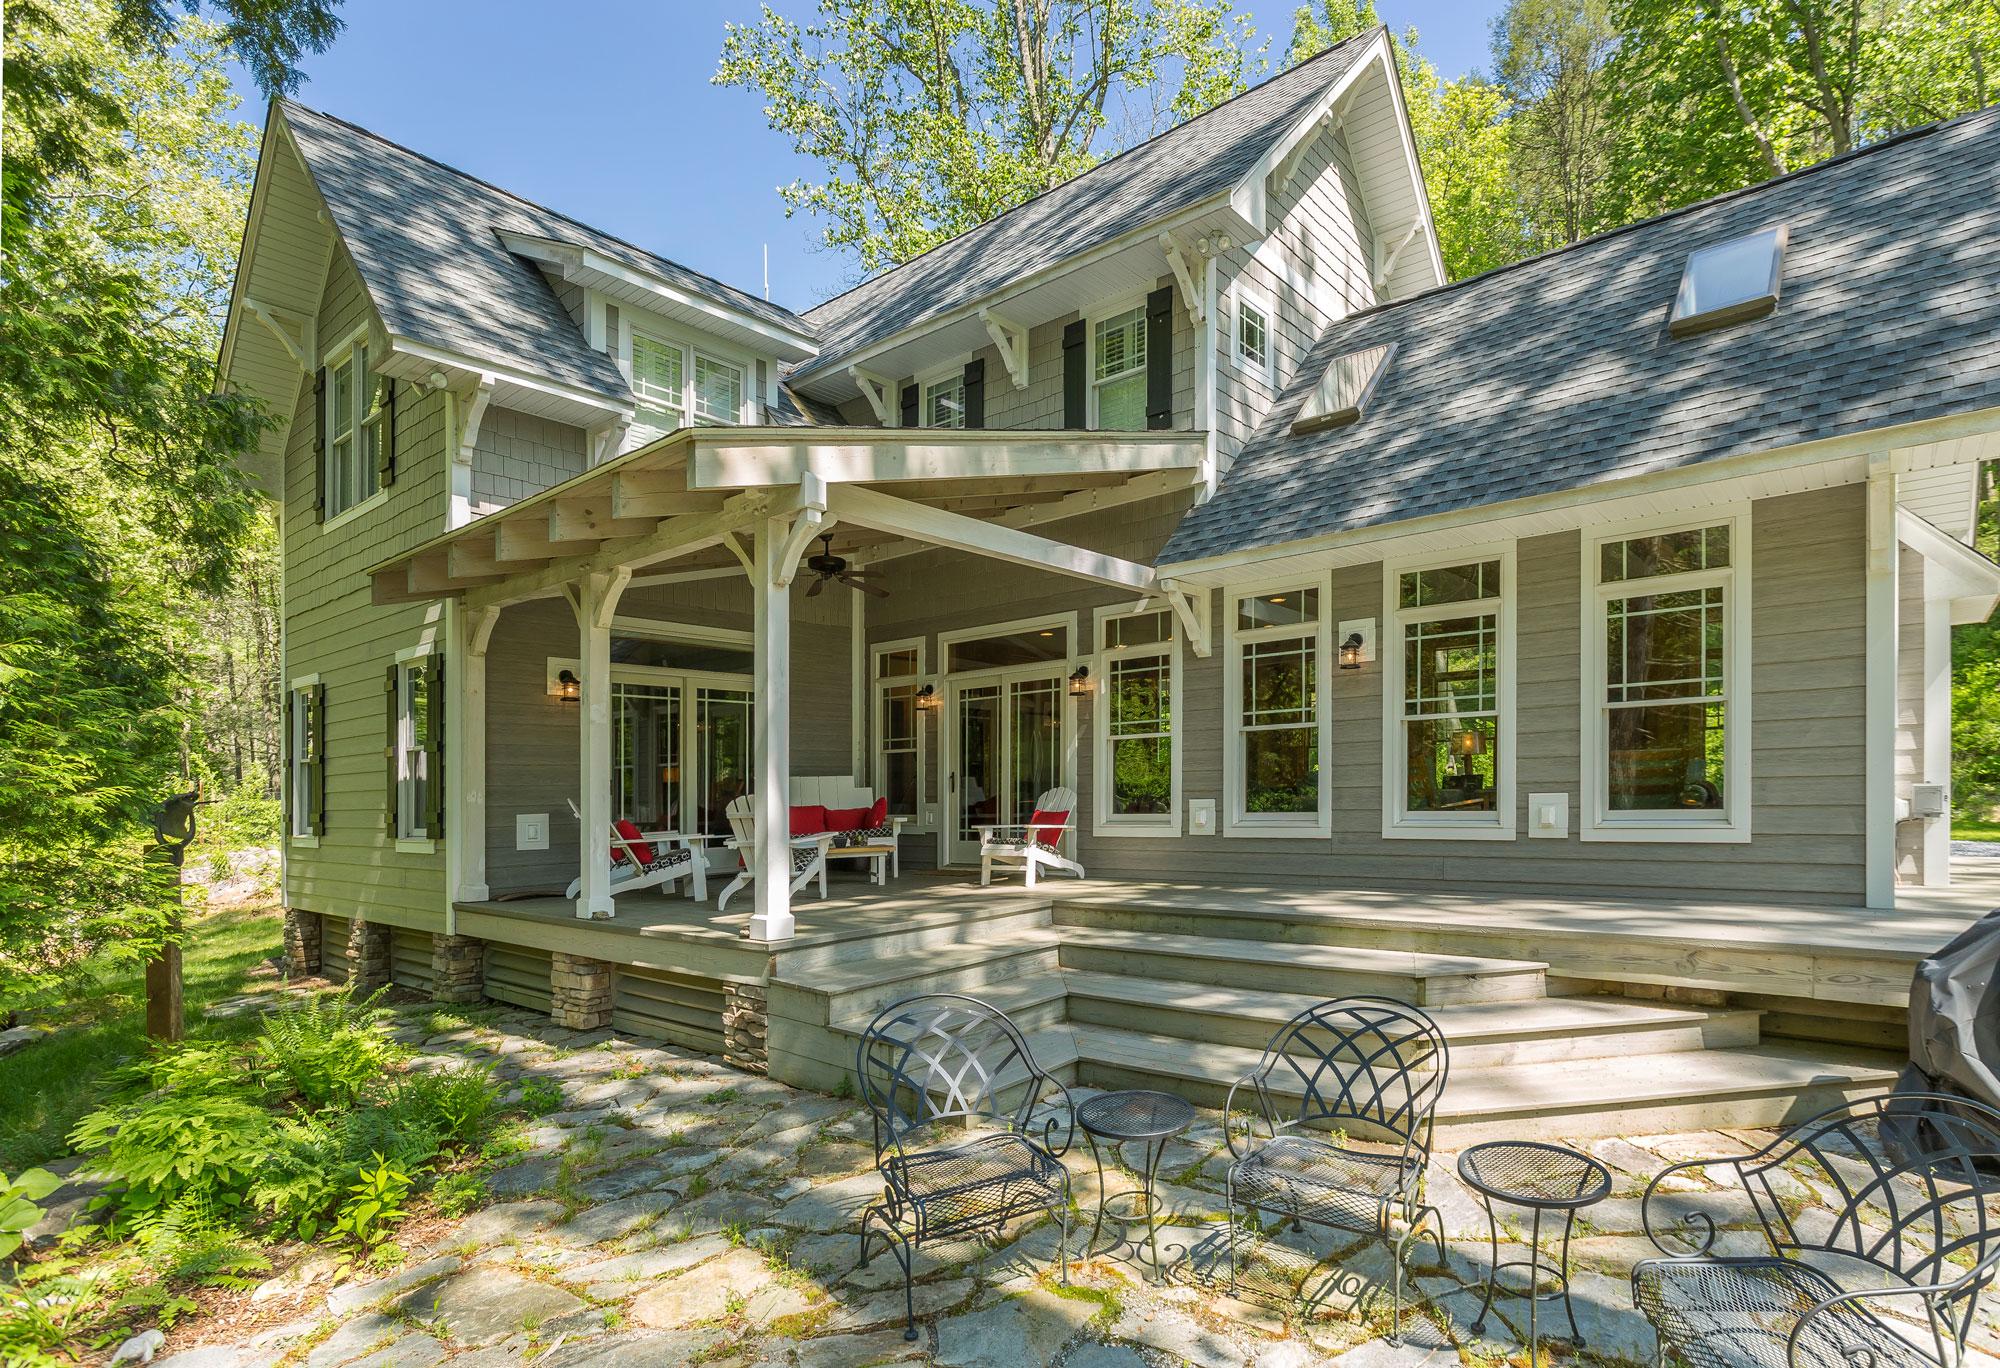 Modular Home Builders Roanoke Va Home Review